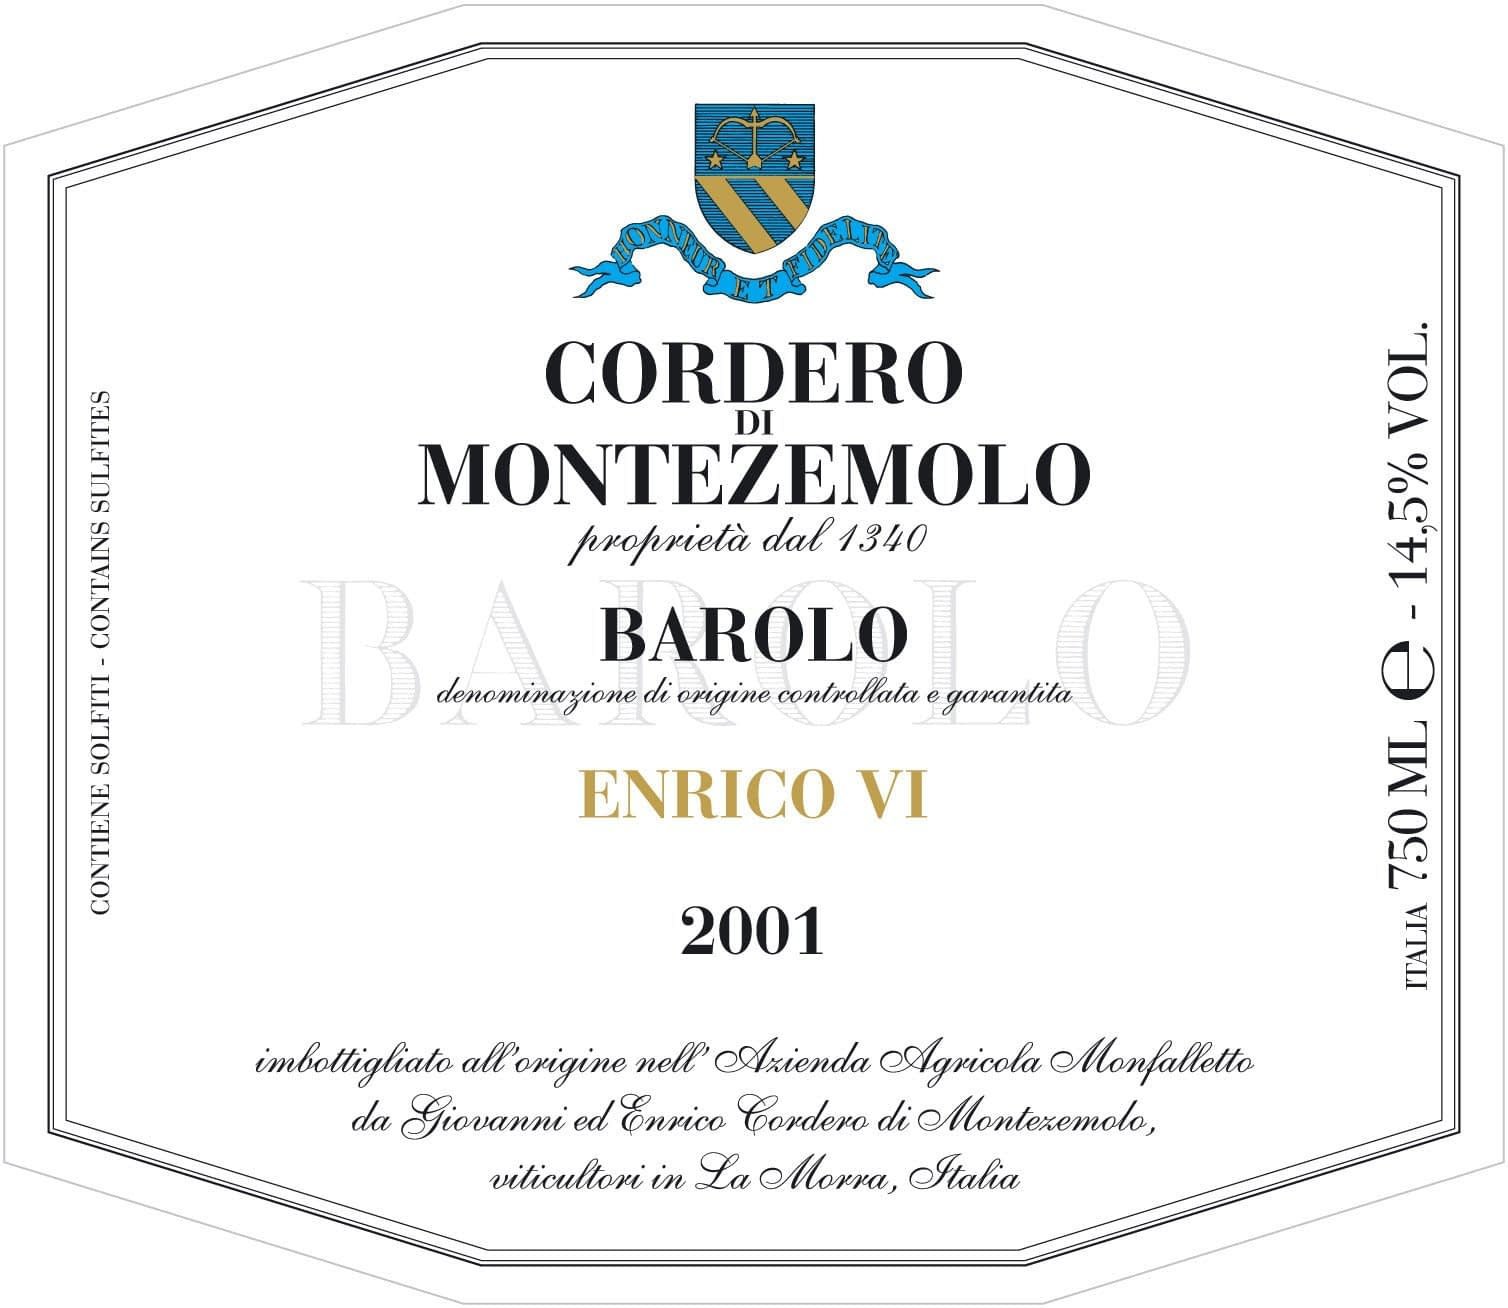 Cordero Barolo Enrico VI Magnum 2016